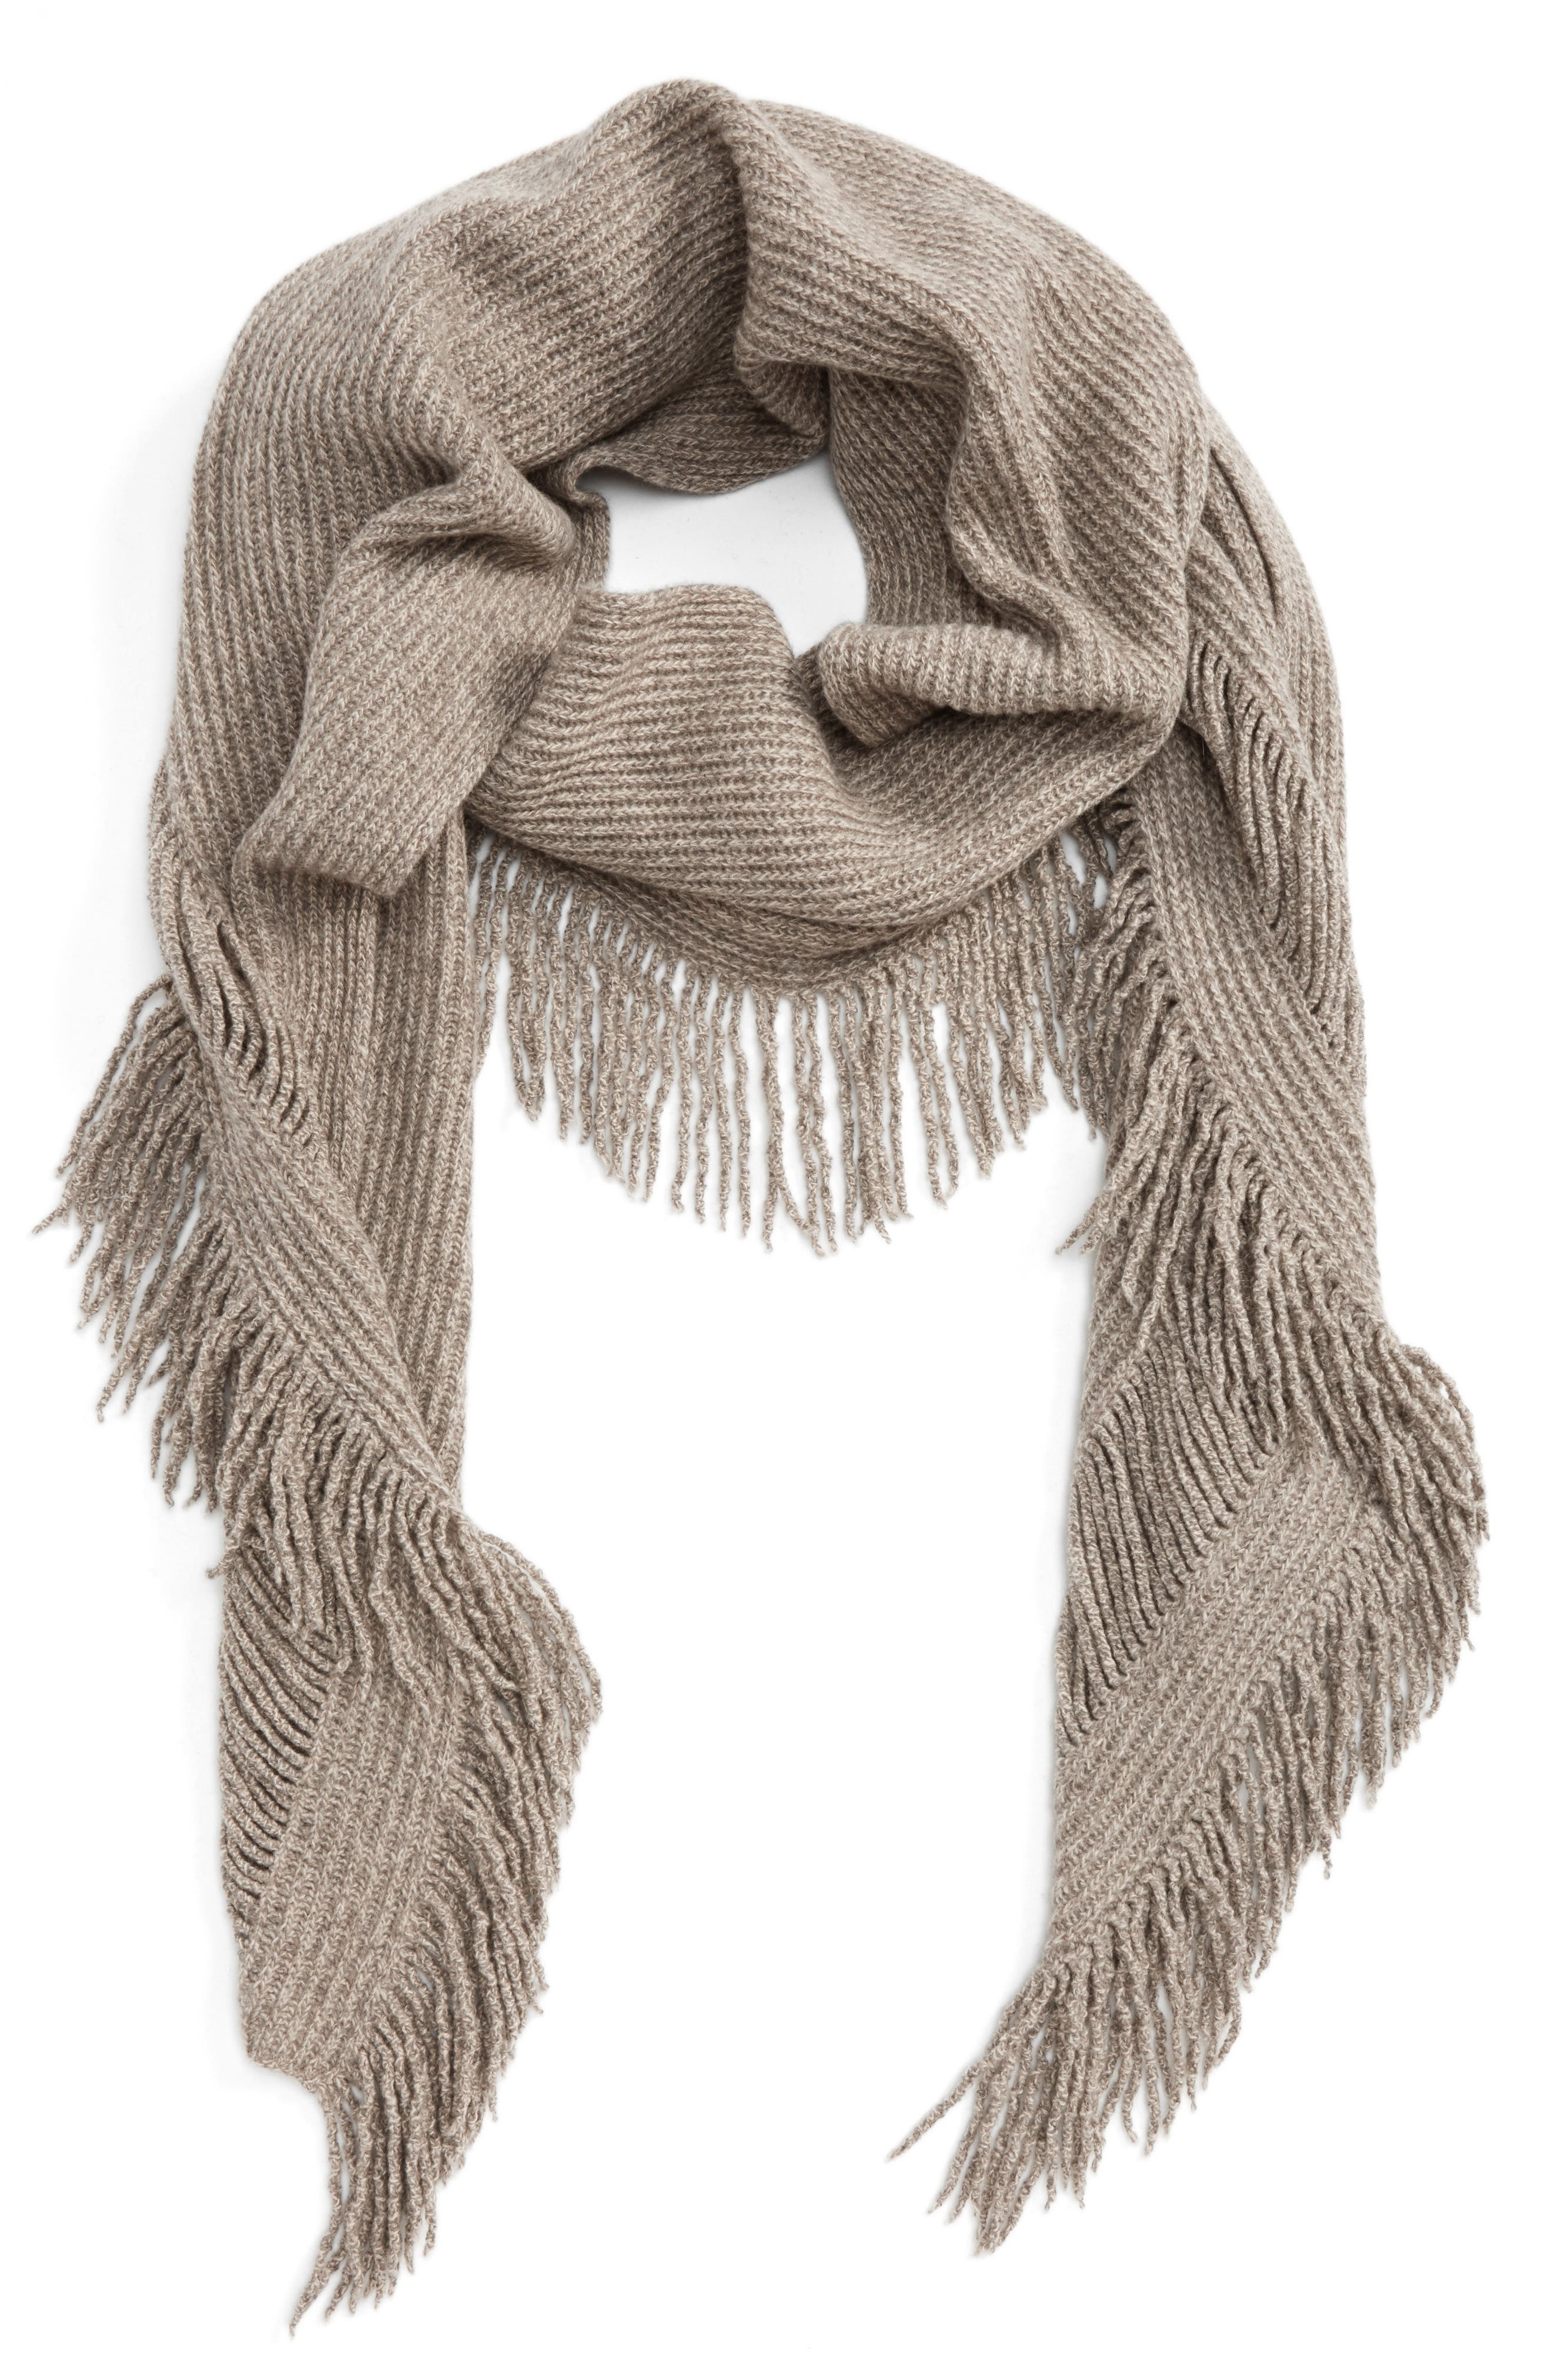 Alternate Image 1 Selected - Stella McCartney Fringe Cashmere & Wool Scarf